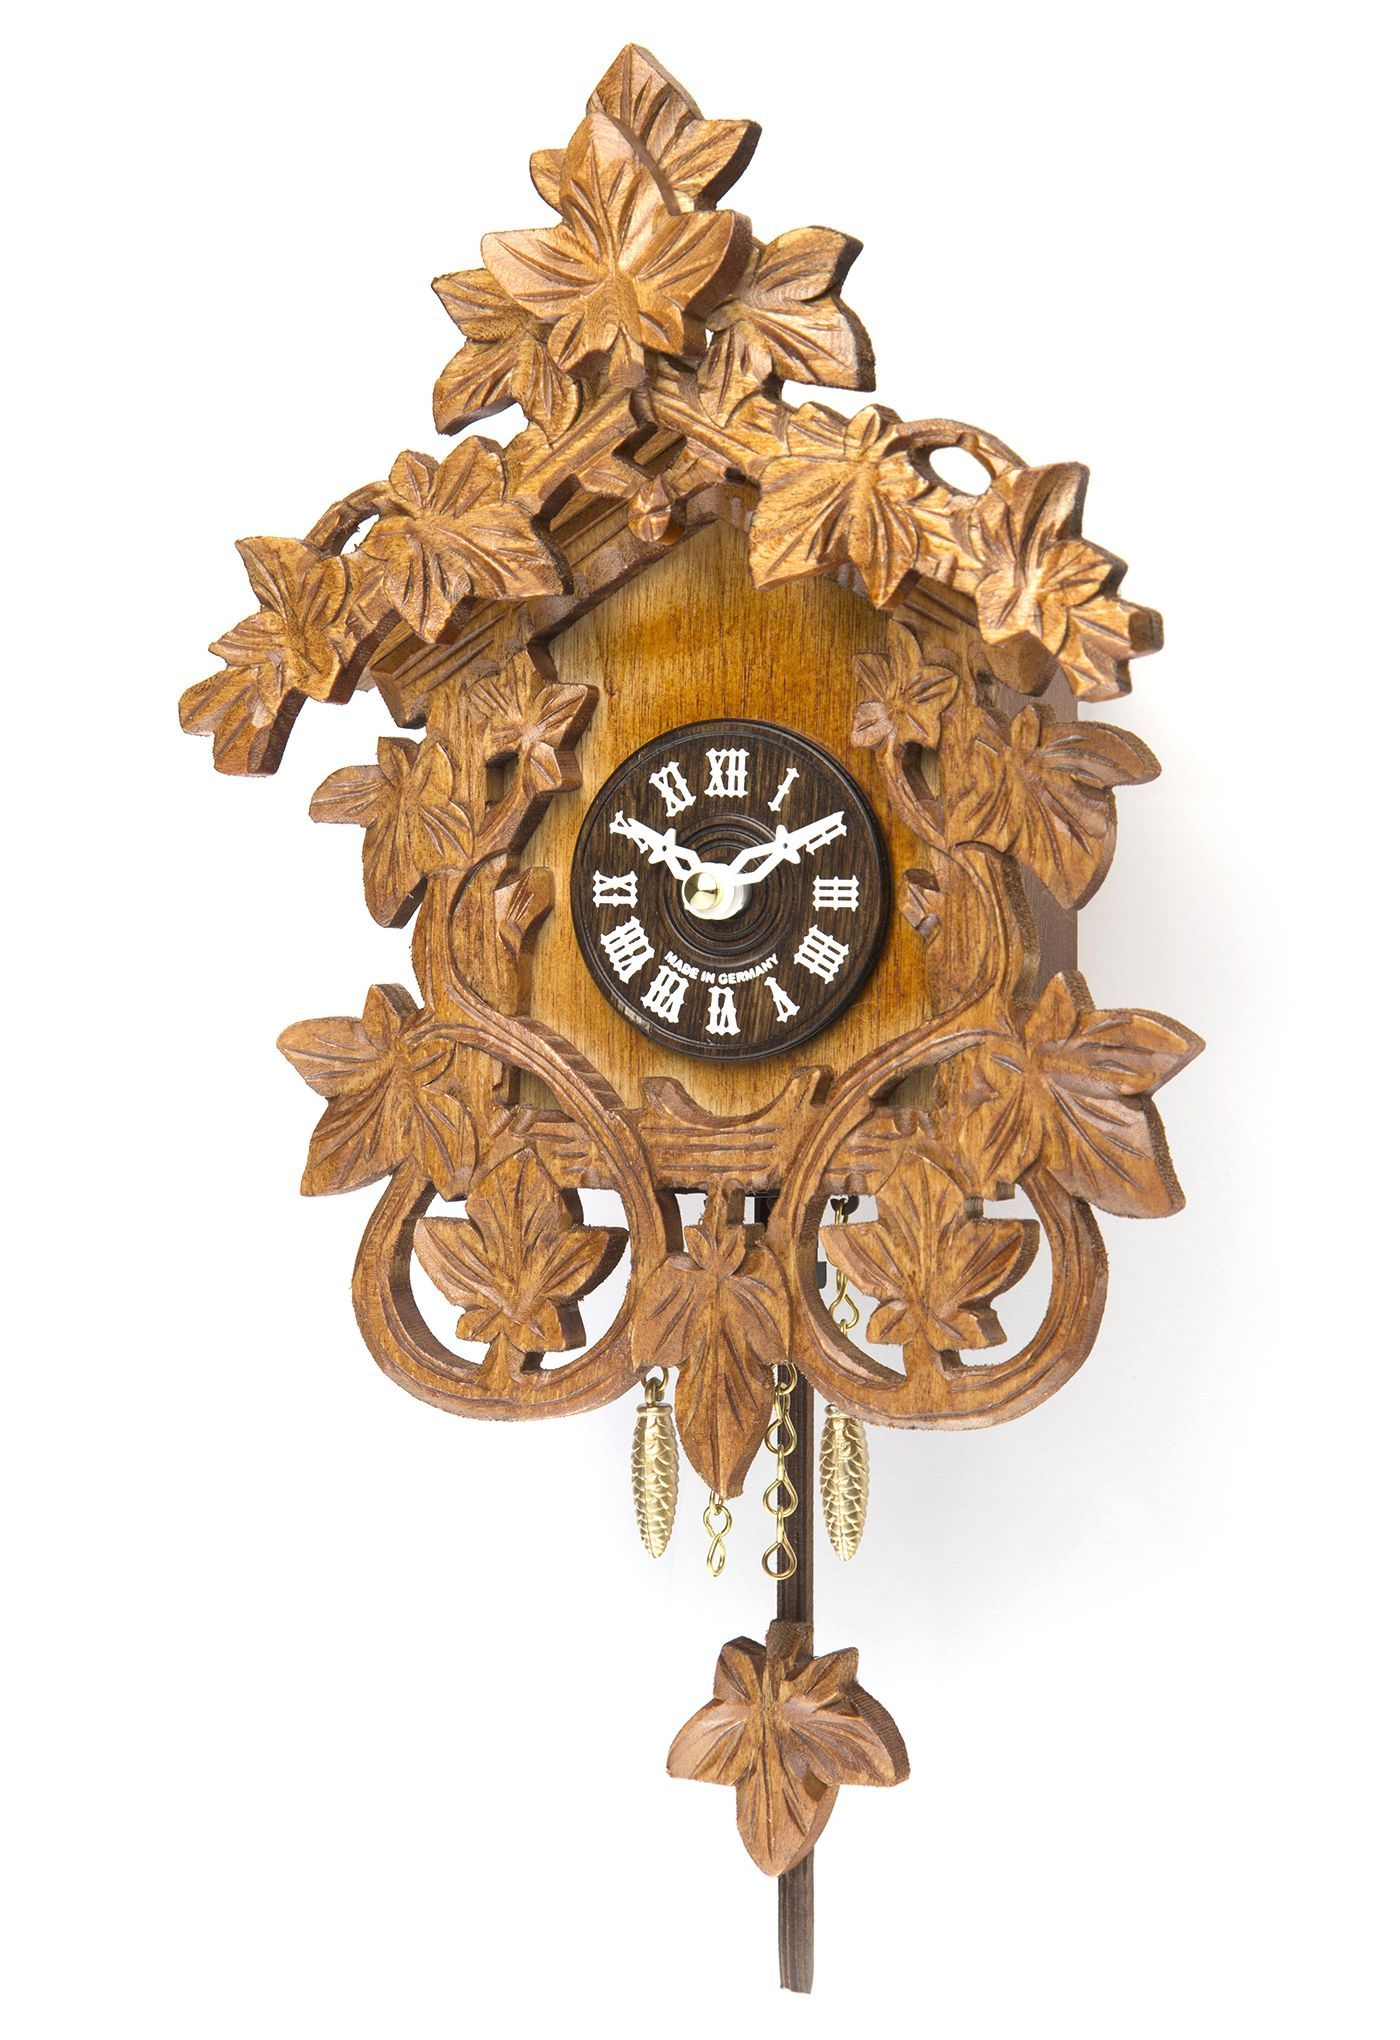 Часы настенные Часы настенные с кукушкой Tomas Stern 5019 chasy-nastennye-s-kukushkoy-tomas-stern-5019-germaniya.jpg